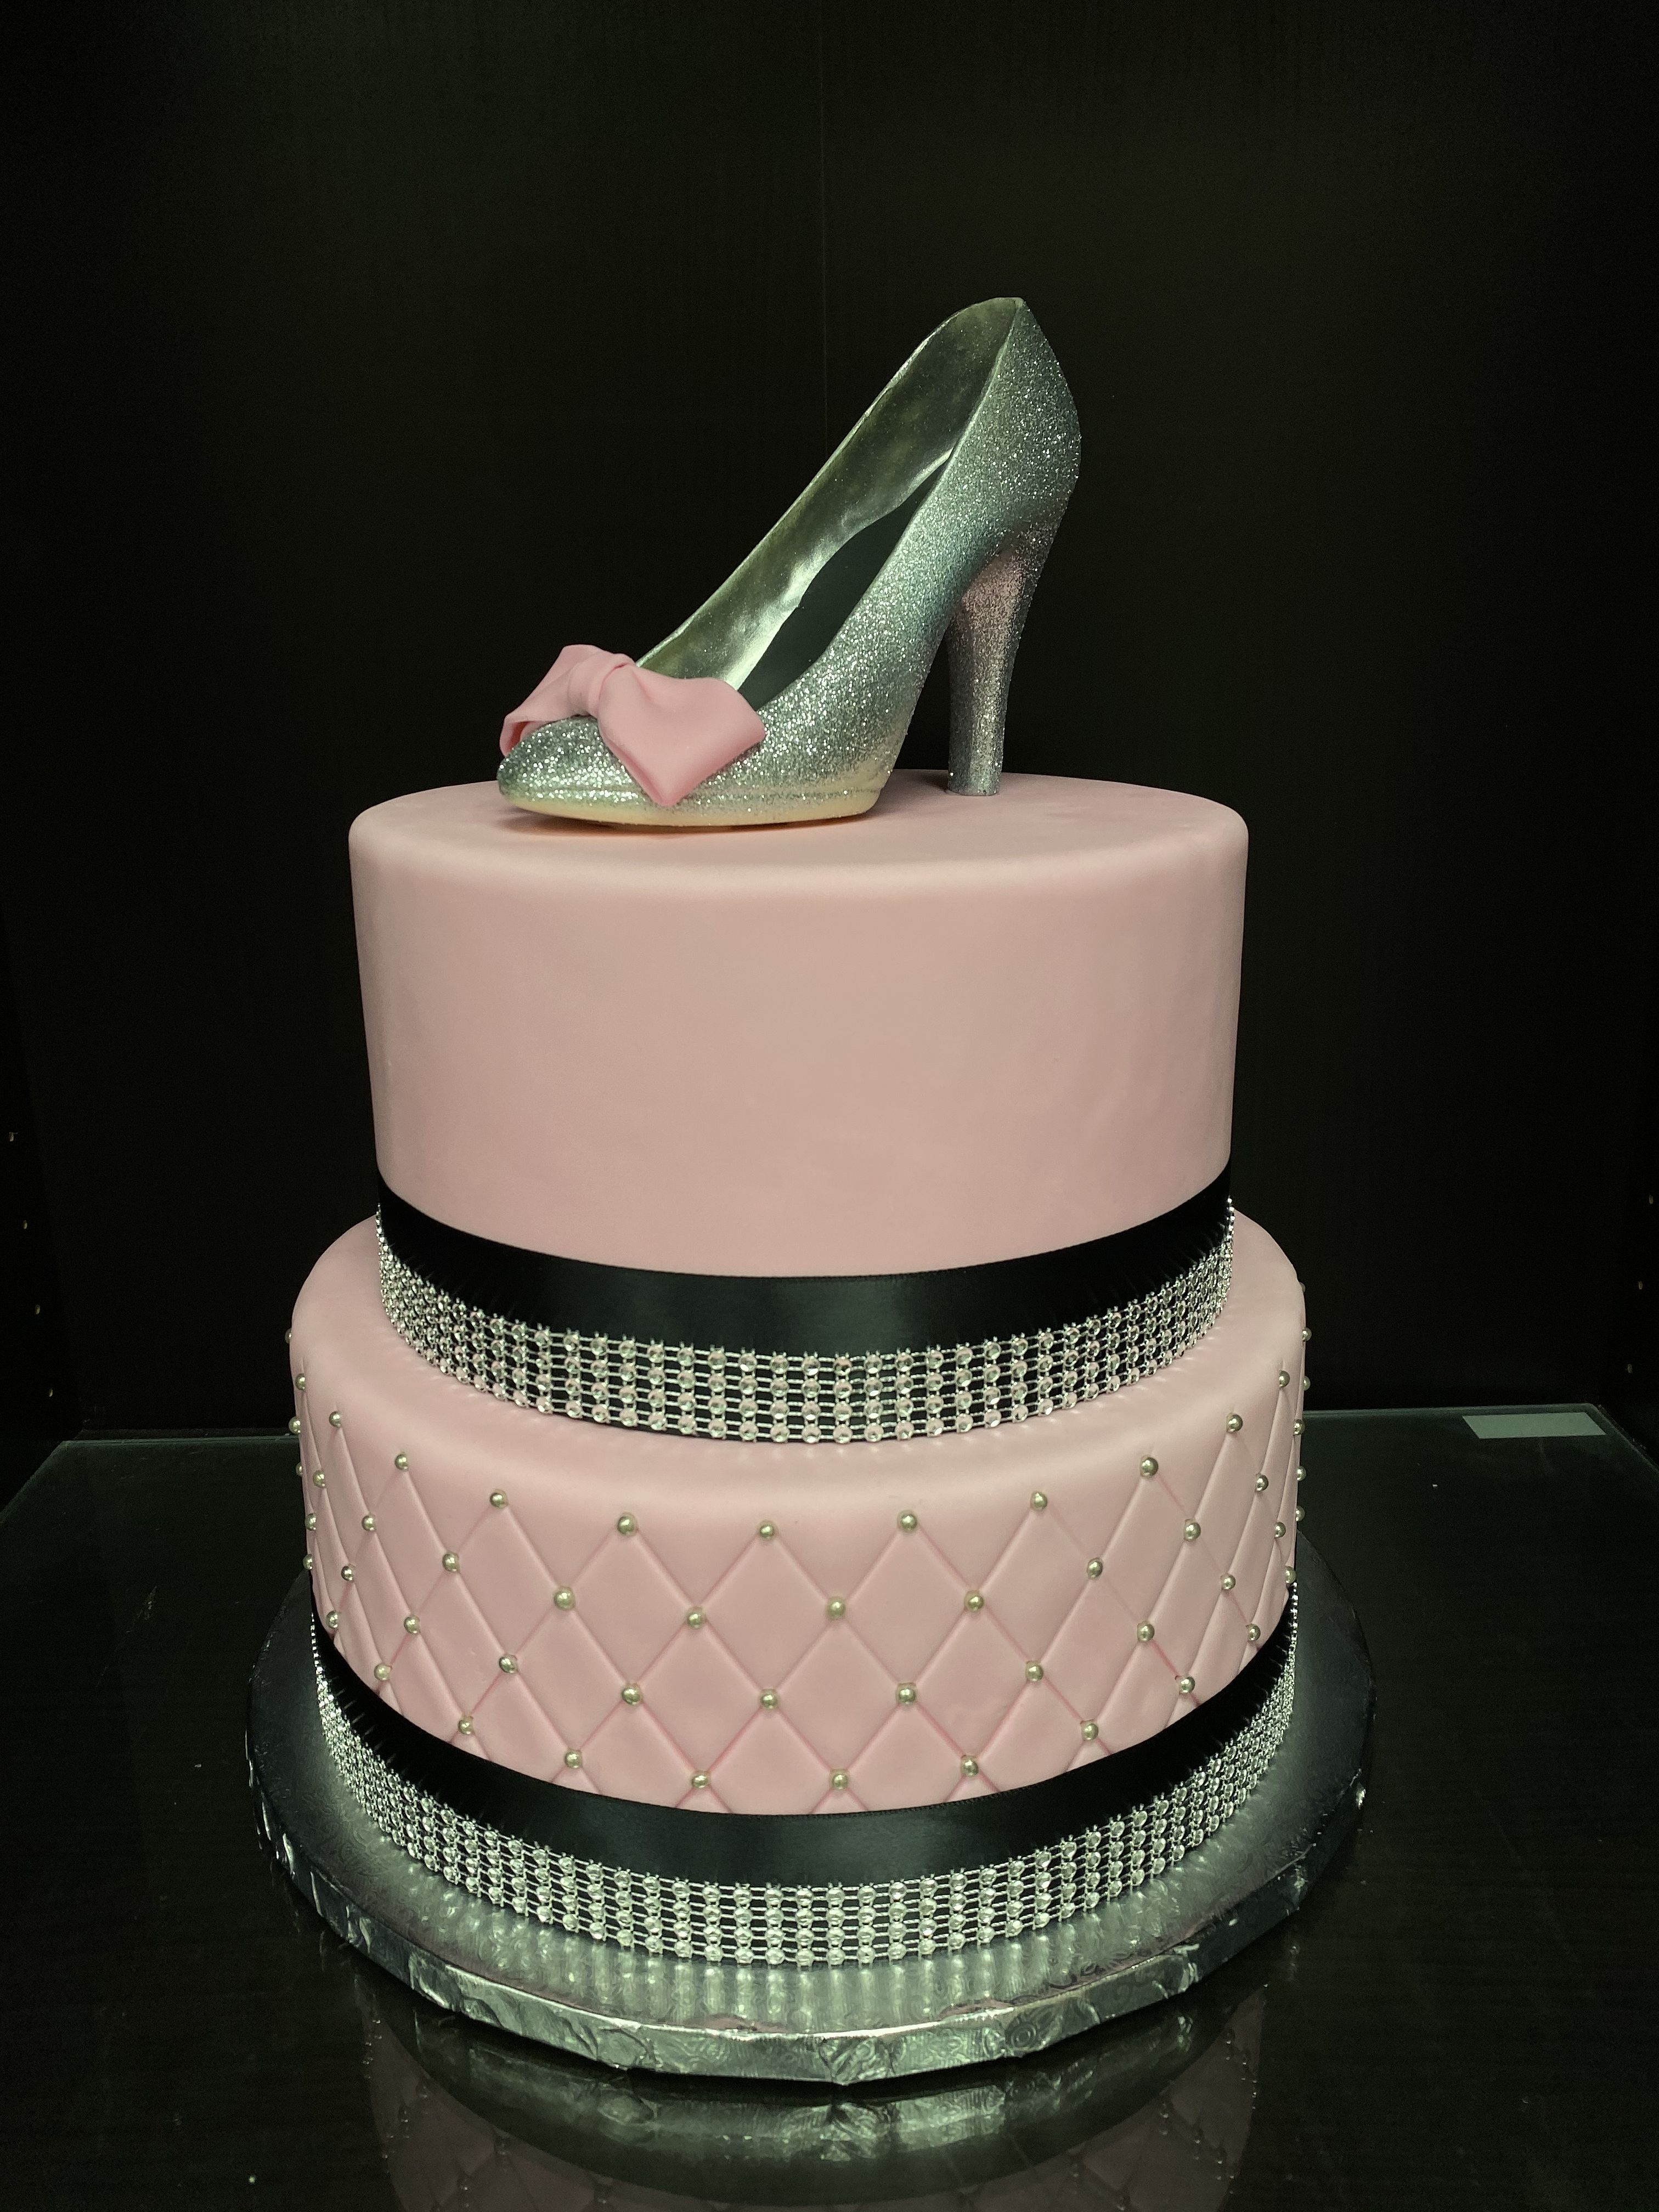 Pin by gourmet goodies cupcake bak on custom cakes